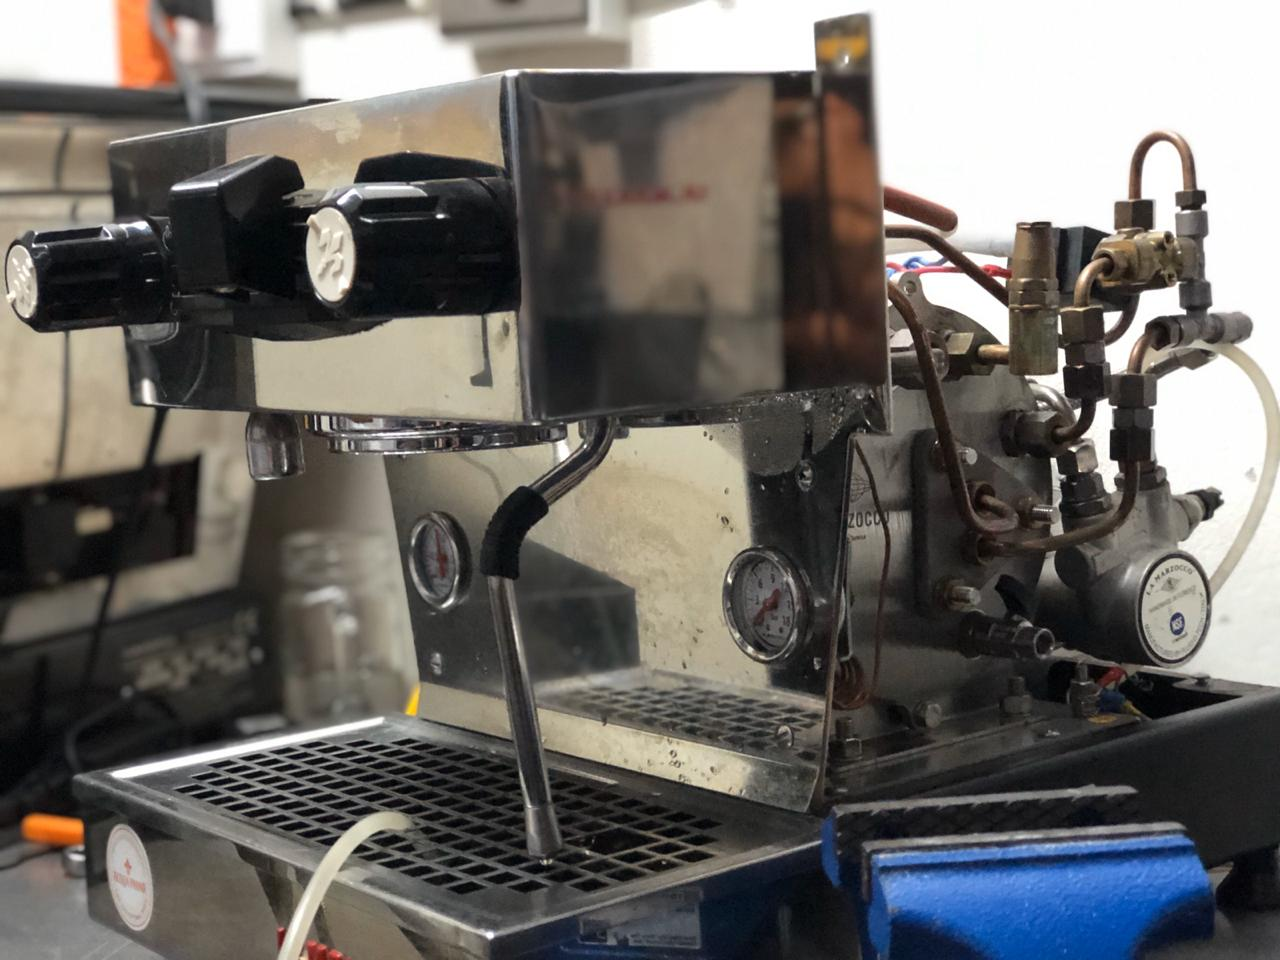 Servicios técnicos Máquinas de Espresso